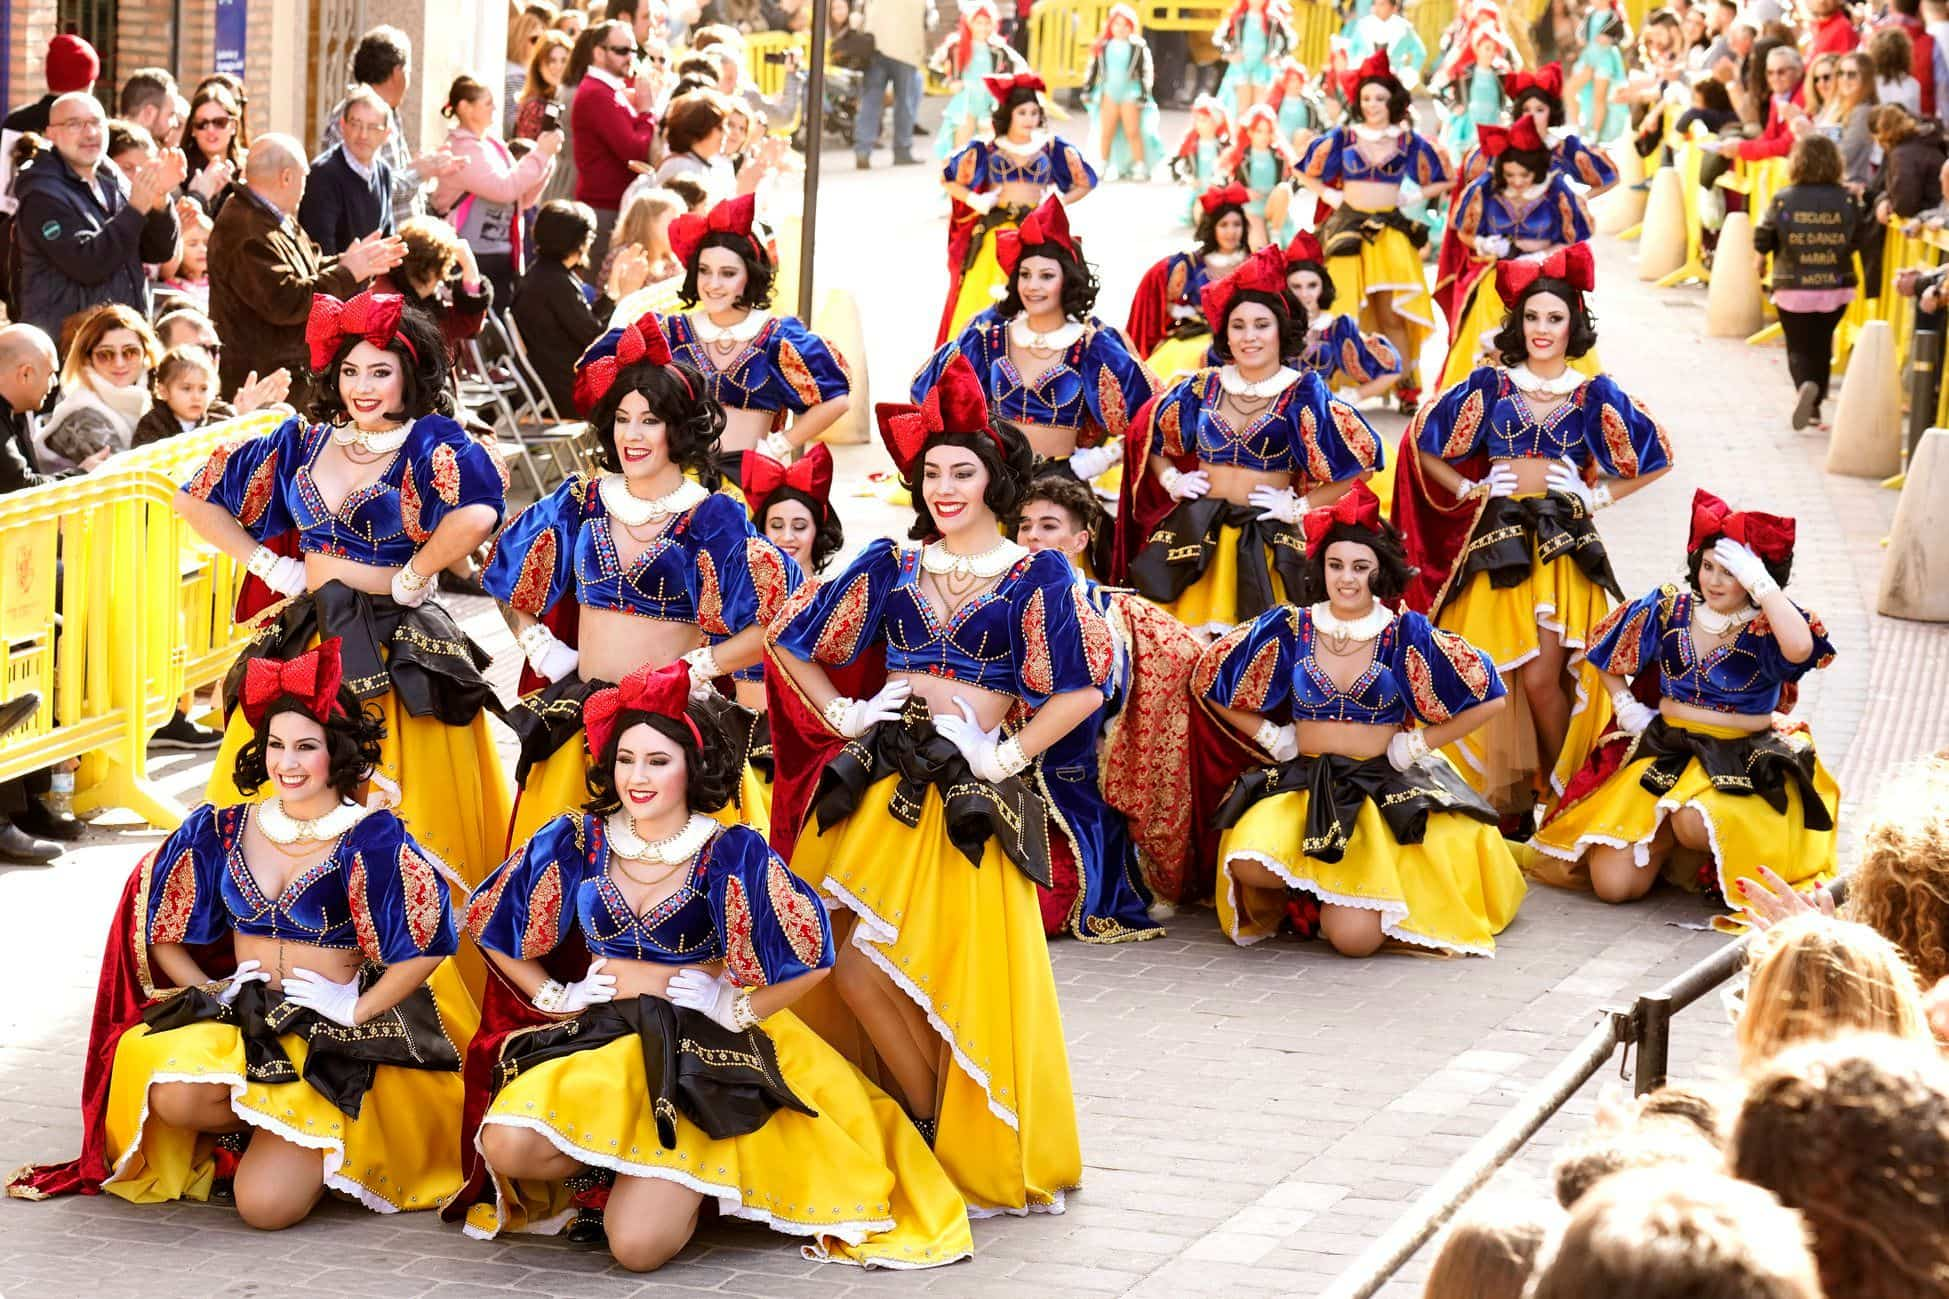 Carnaval de herencia 2020 ofertorio 161 - Selección de fotografías del Ofertorio del Carnaval de Herencia